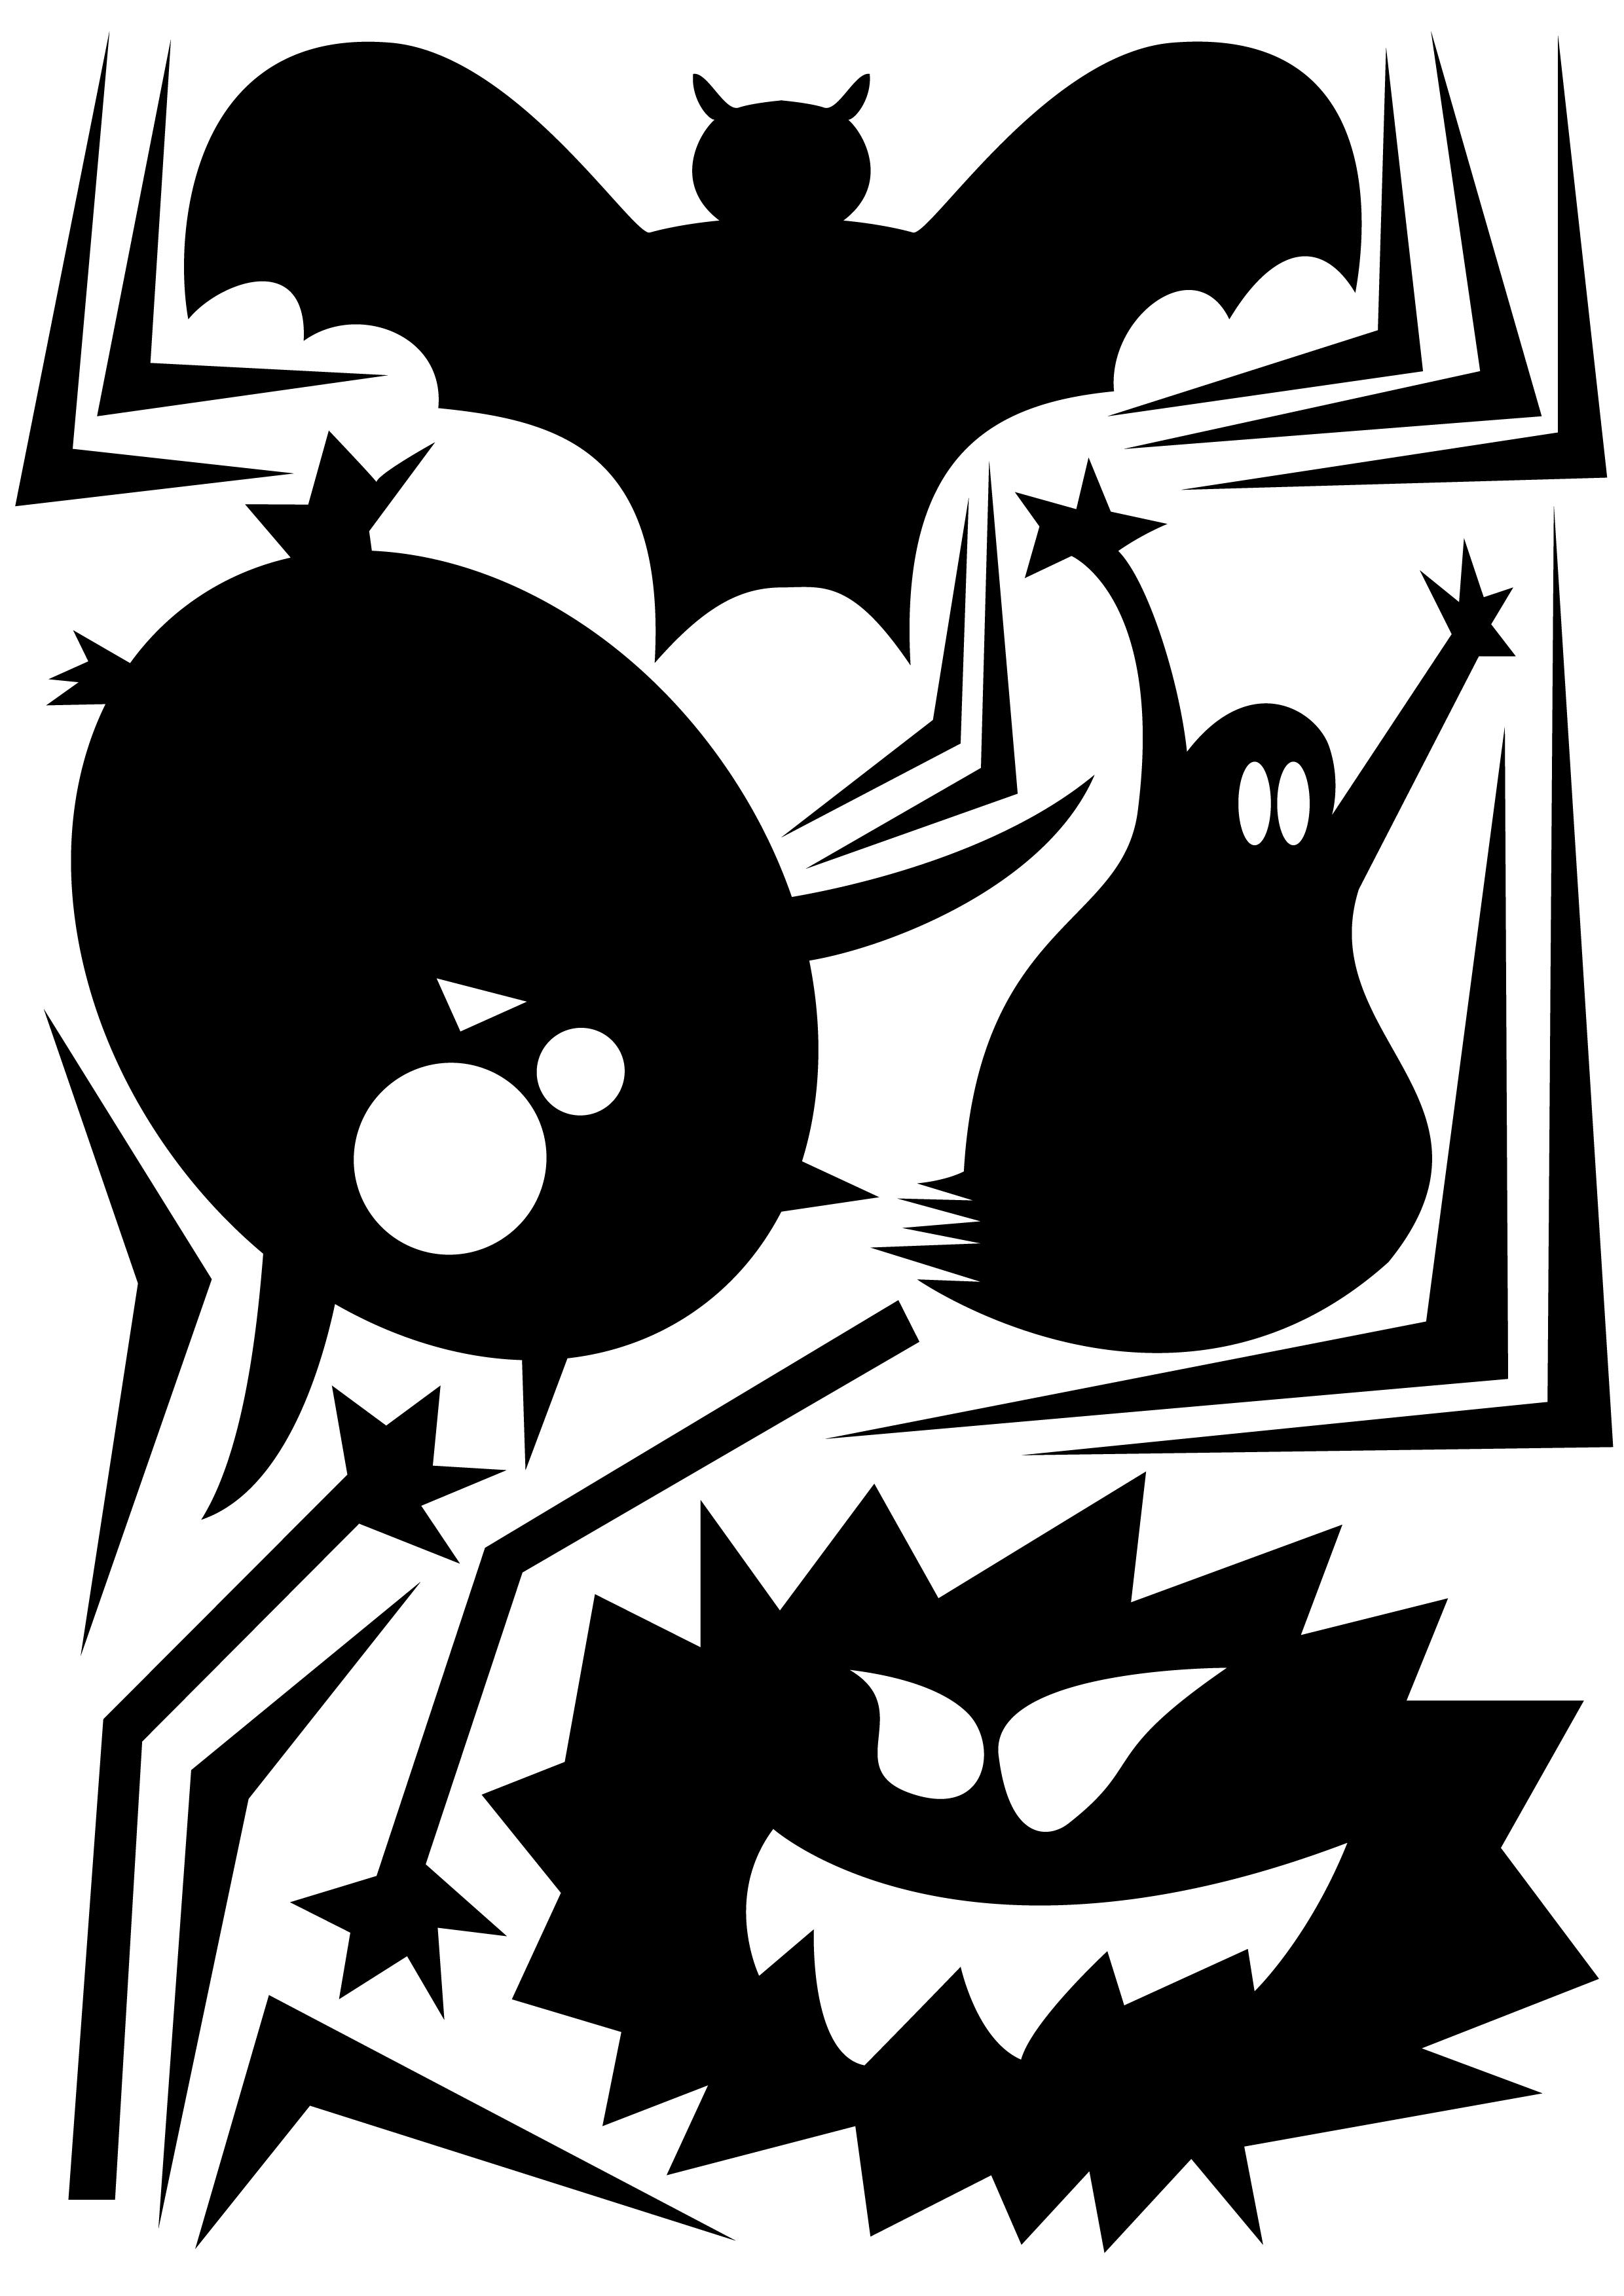 atelier creatif enfant decoupage halloween deco activite creative